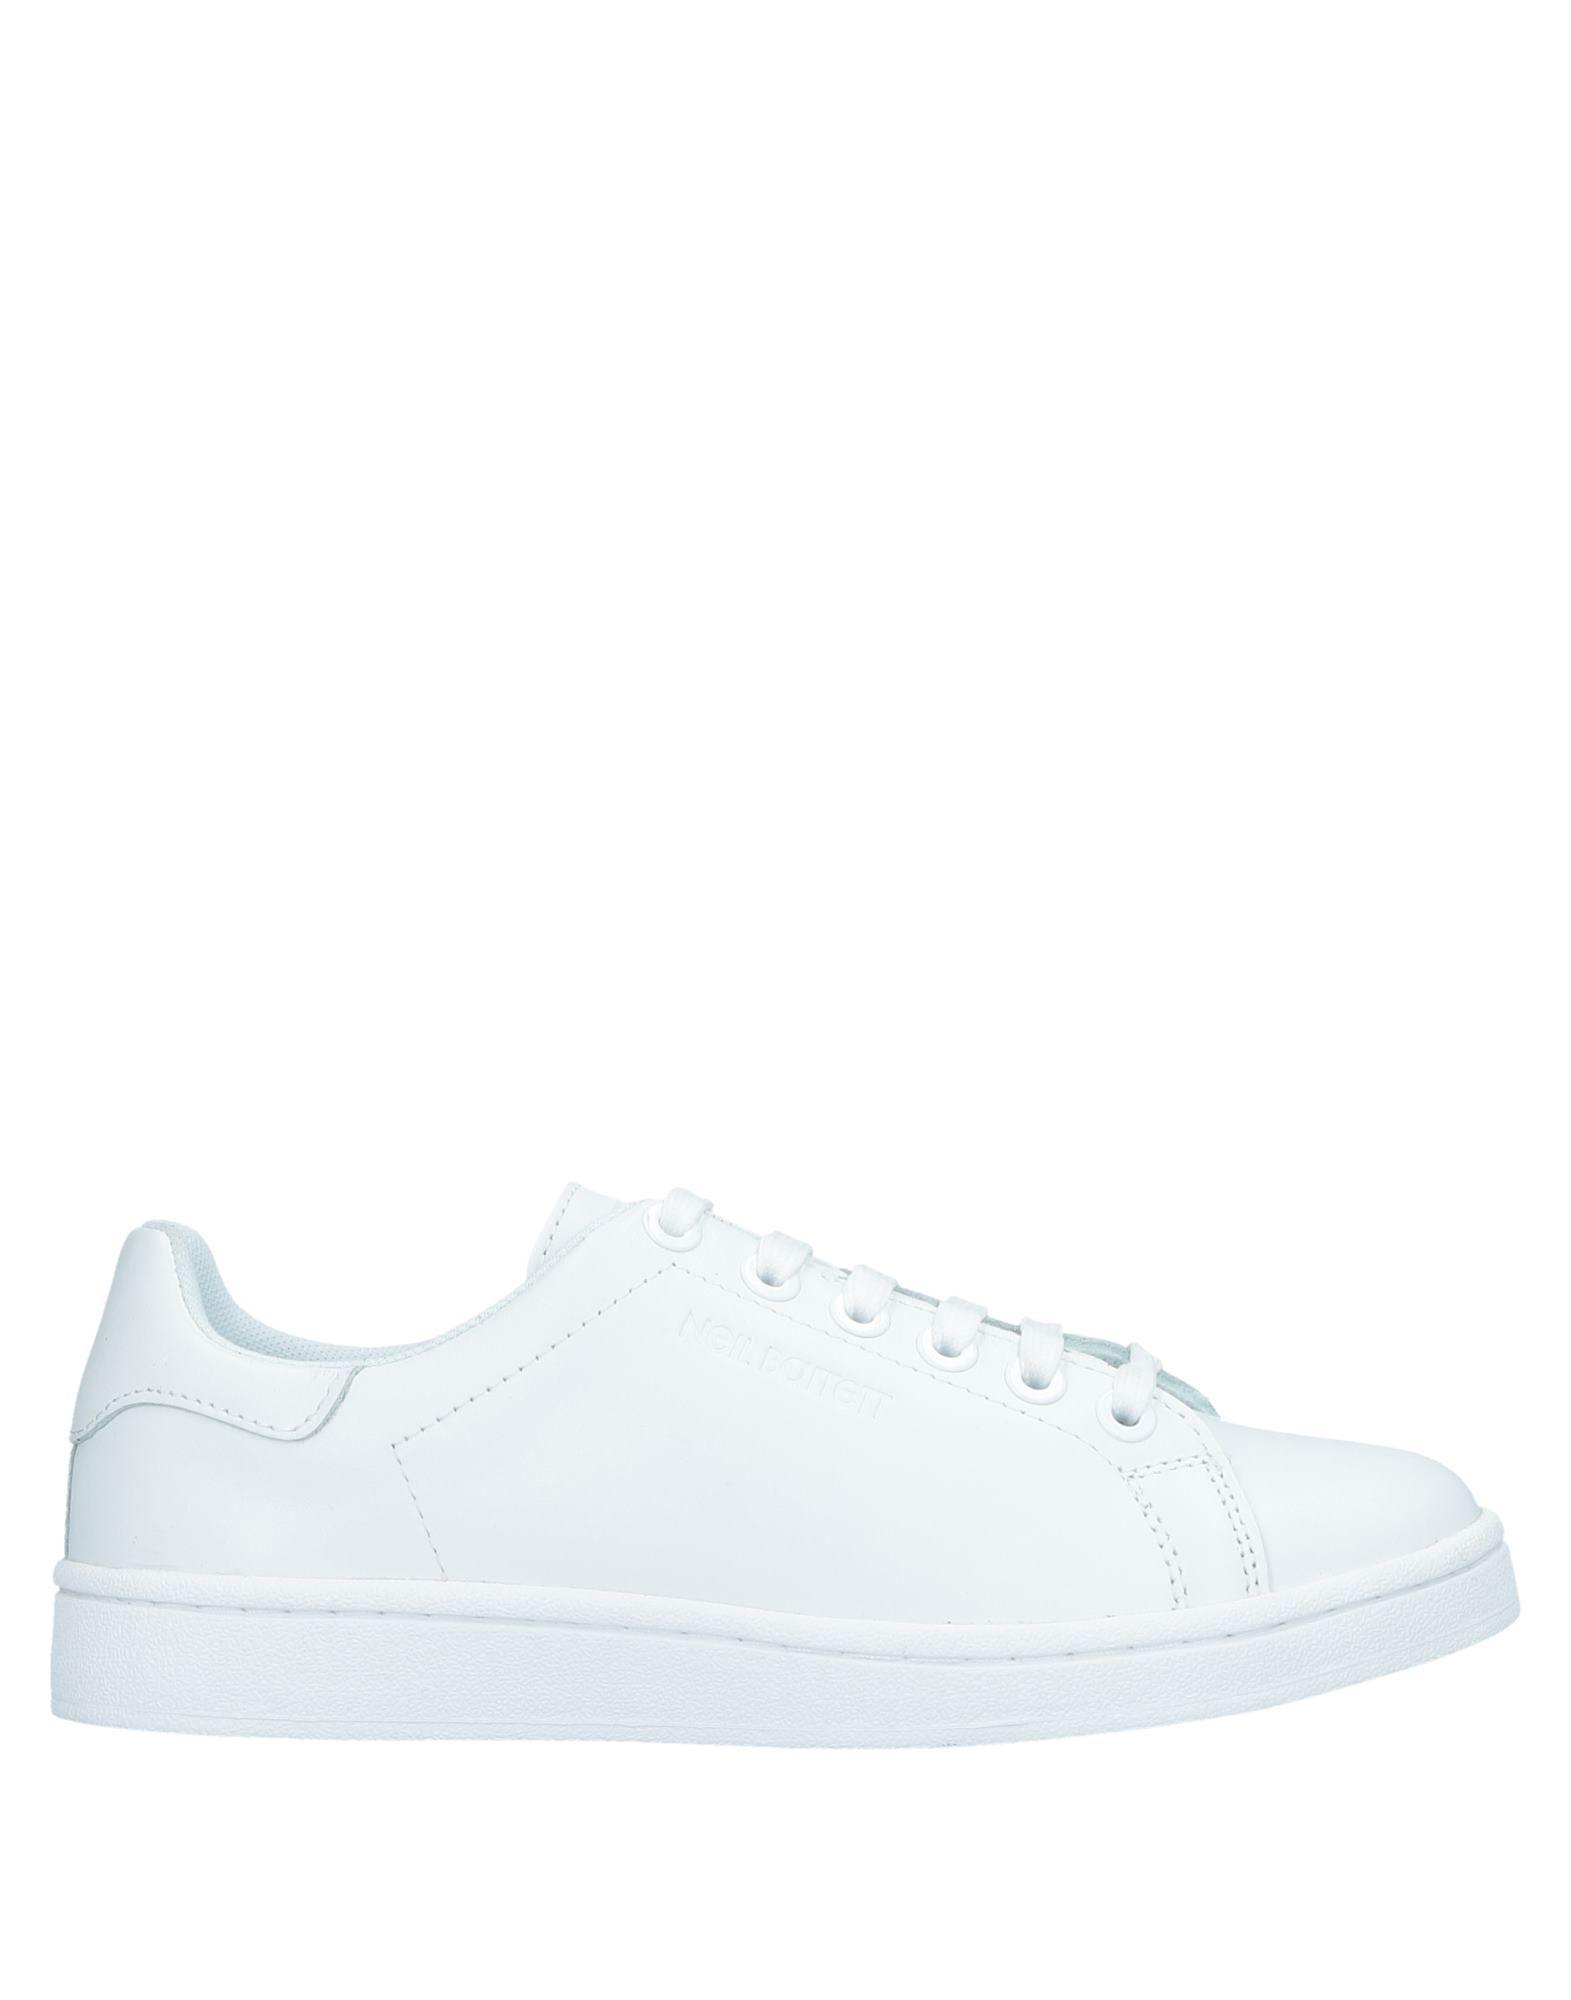 Rabatt Schuhe Neil Barrett Sneakers Damen  11529021VE